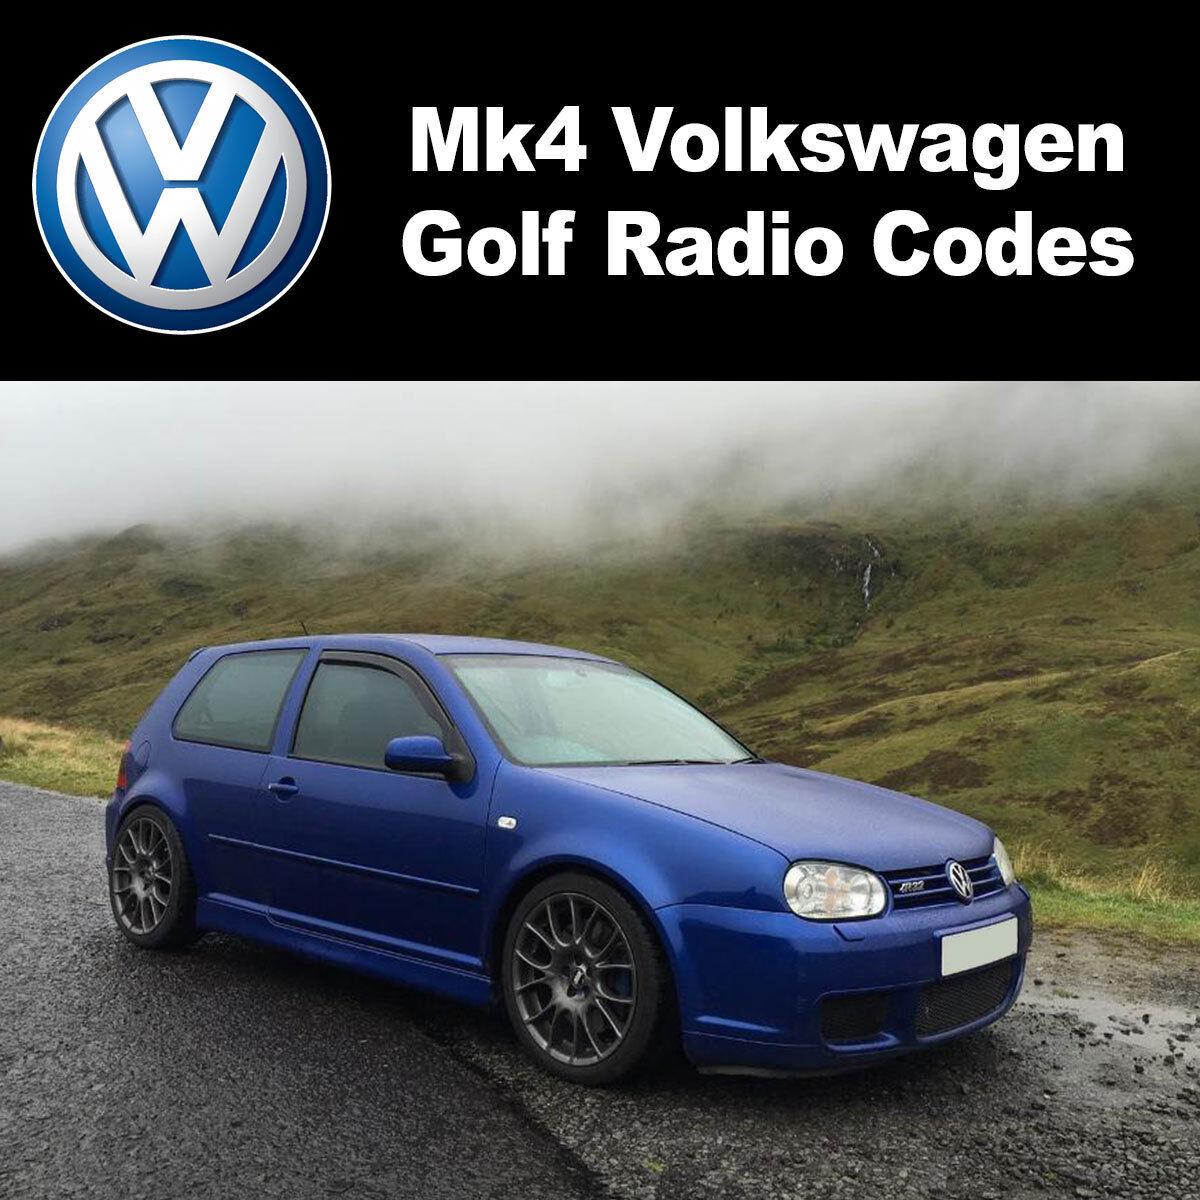 Volkswagen VW Polo Radio Code Unlock Stereo Codes RCD 310 300 200 210 215